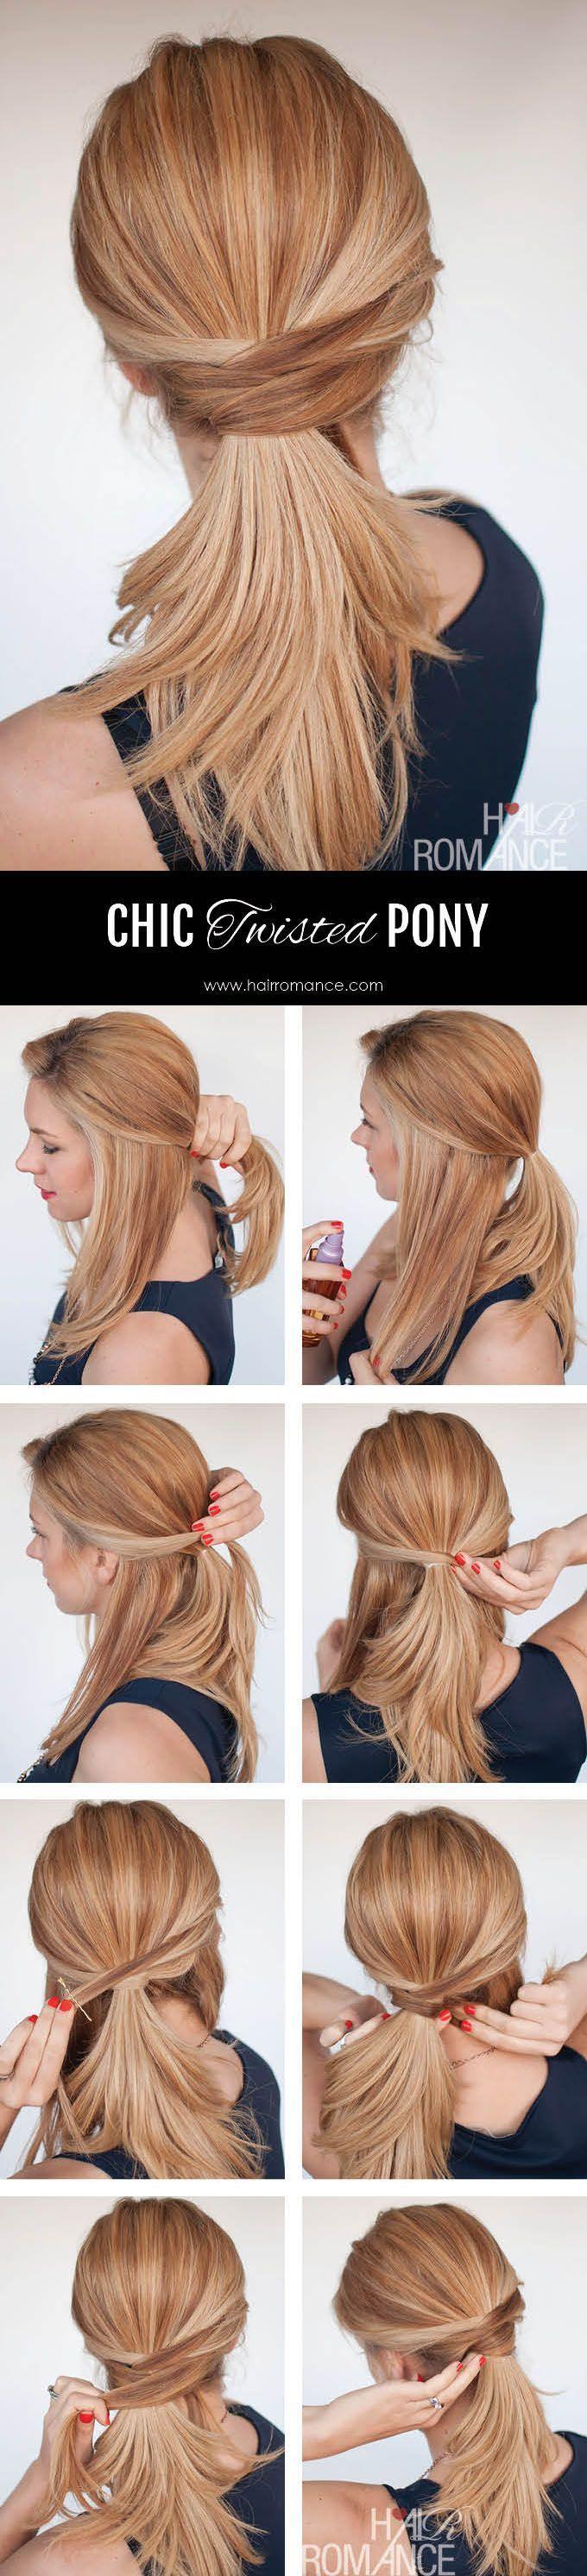 Such an easy tutorial my style pinterest tutorials hair style